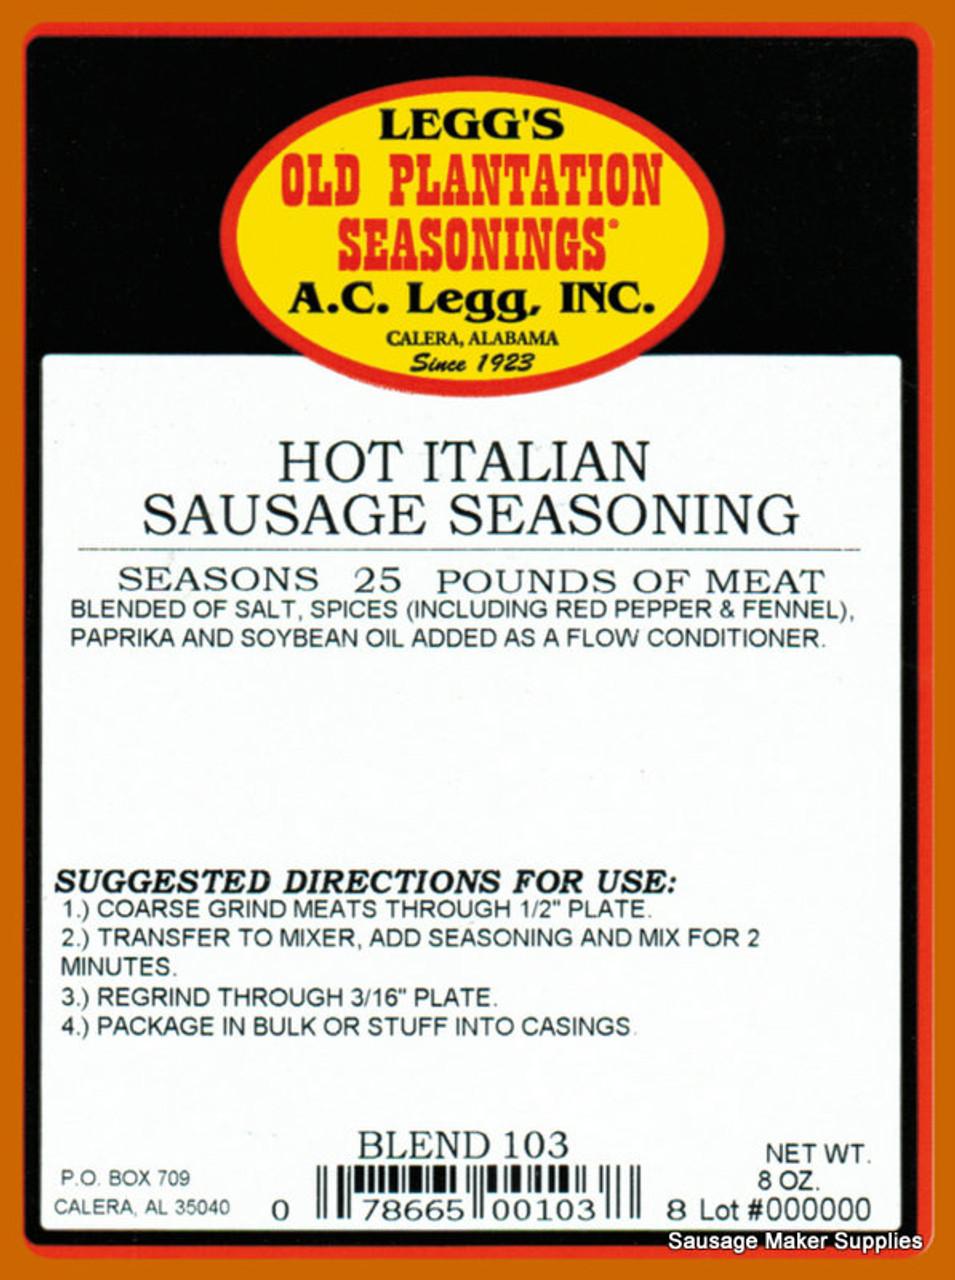 A.C.LEGG OLD PLANTATION Hot Italian Sausage Seasoning Blend 103